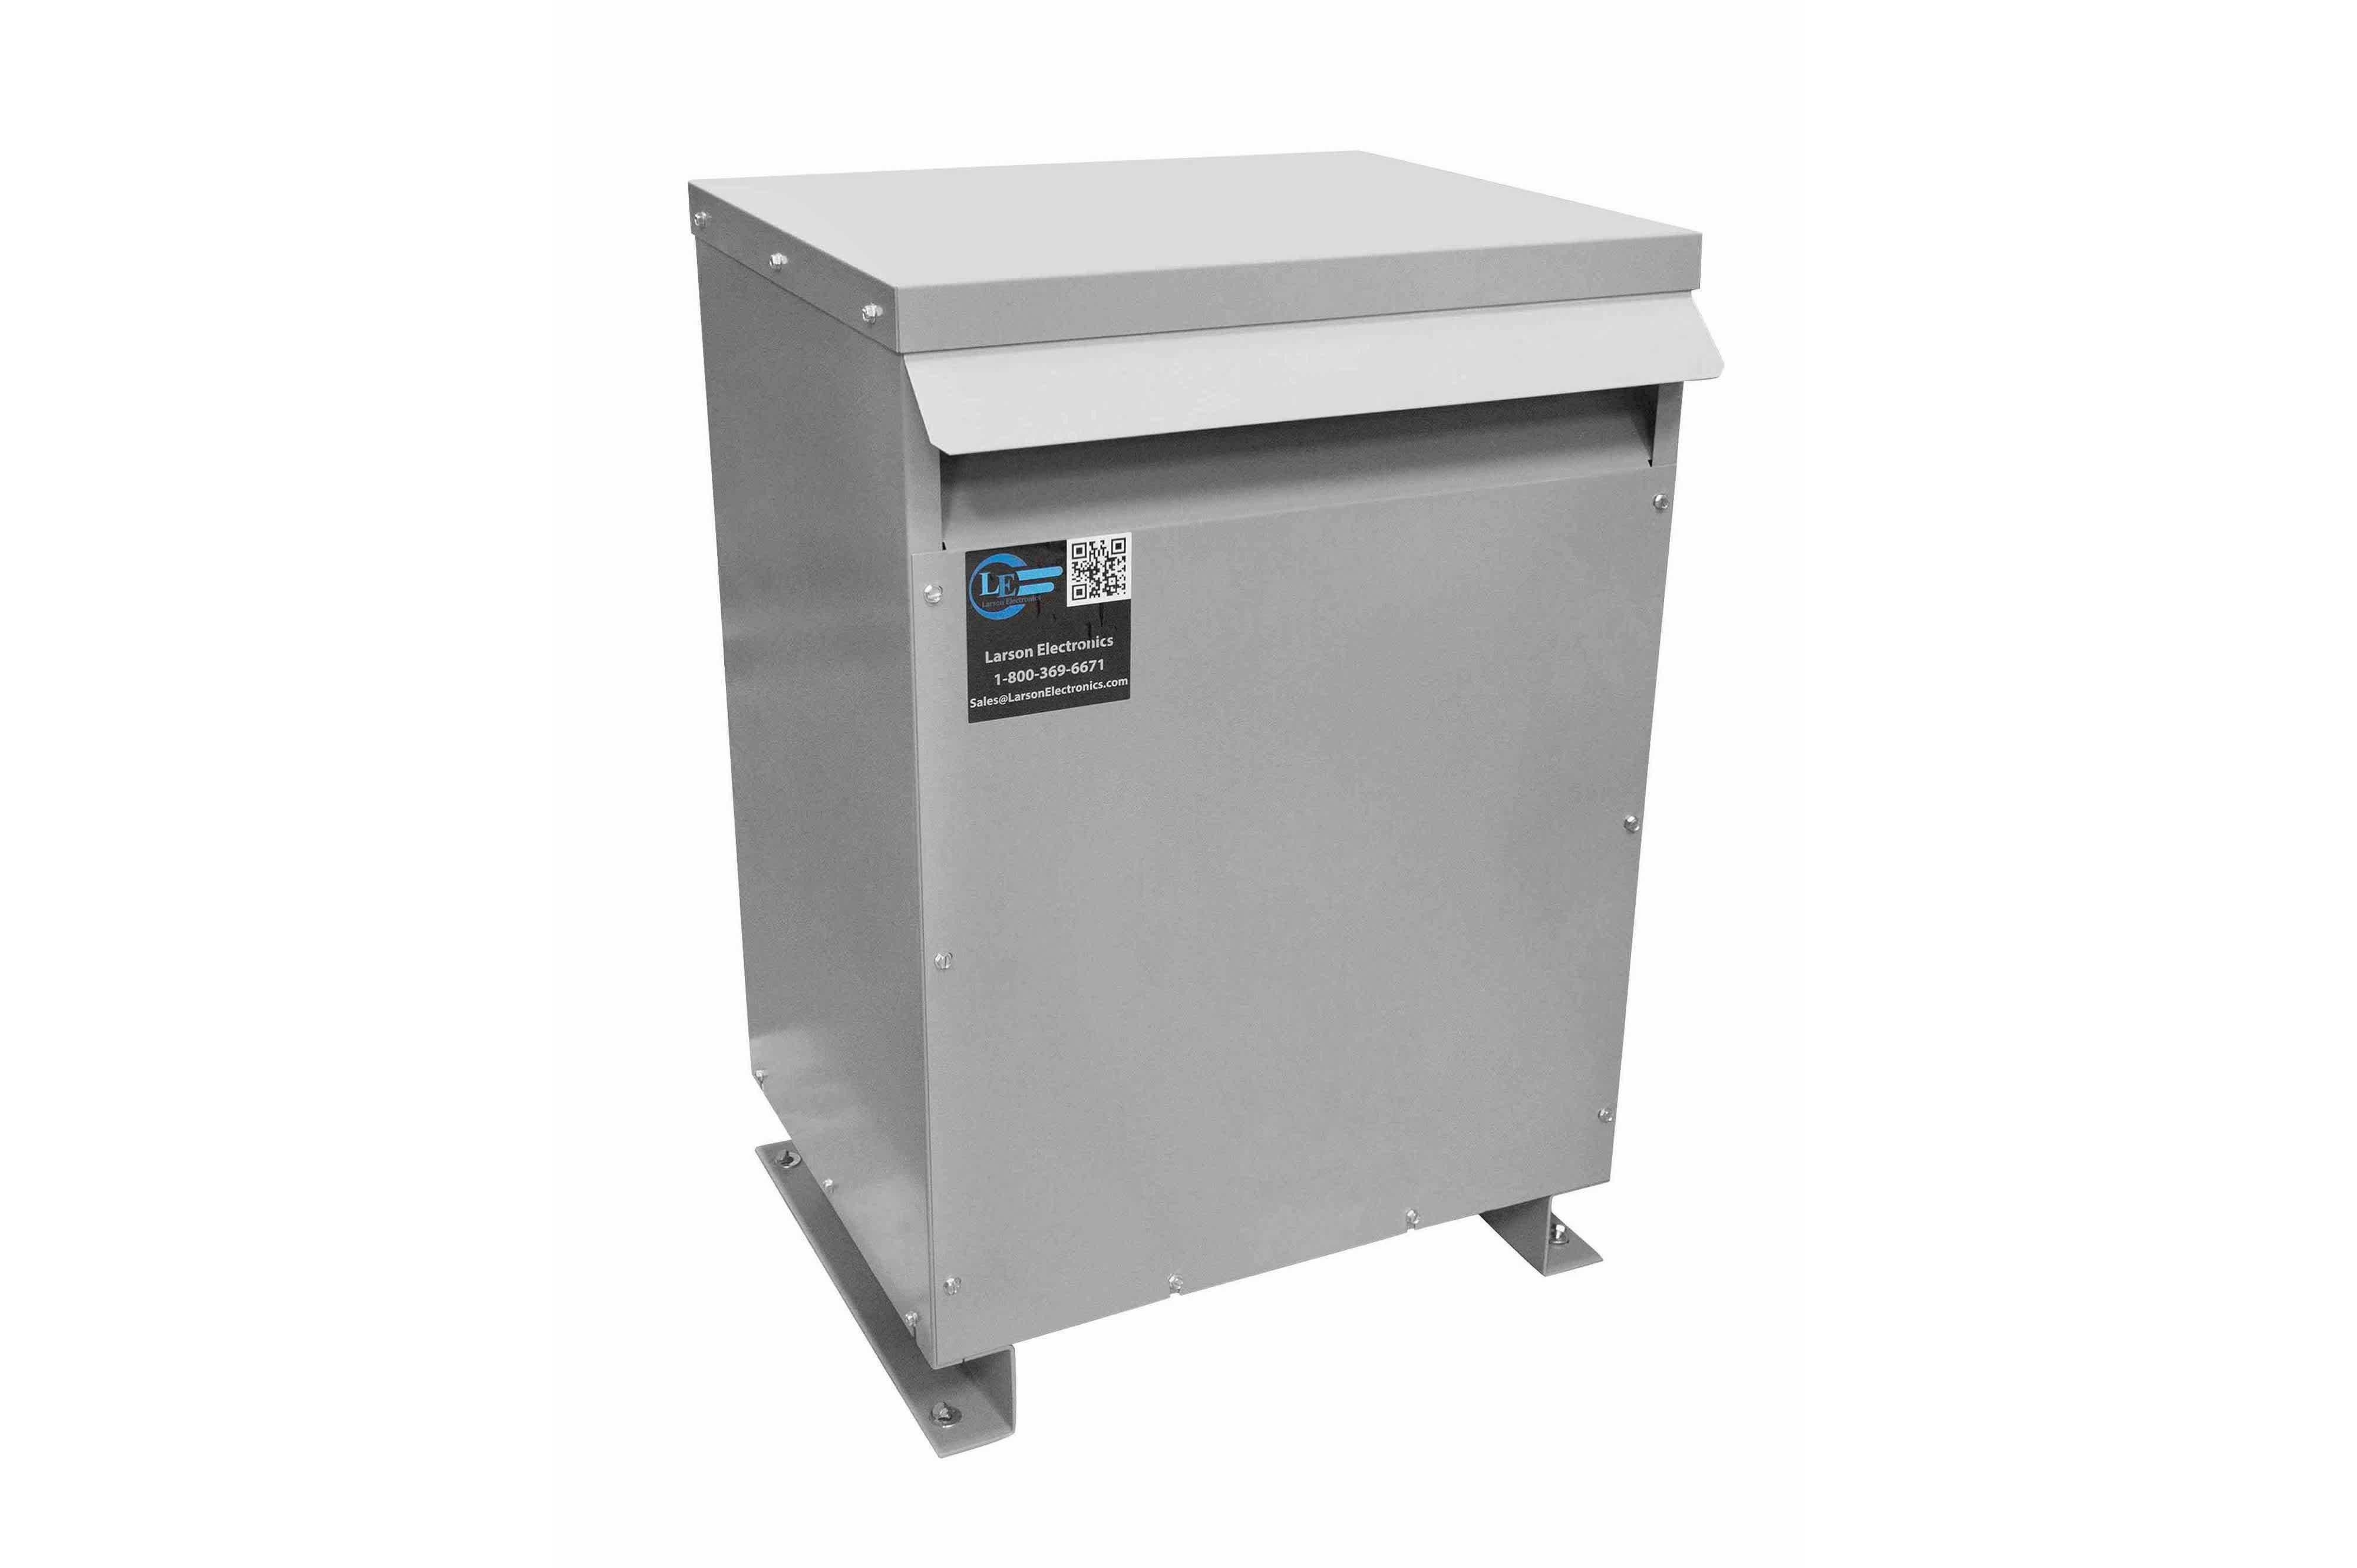 250 kVA 3PH Isolation Transformer, 600V Wye Primary, 415V Delta Secondary, N3R, Ventilated, 60 Hz